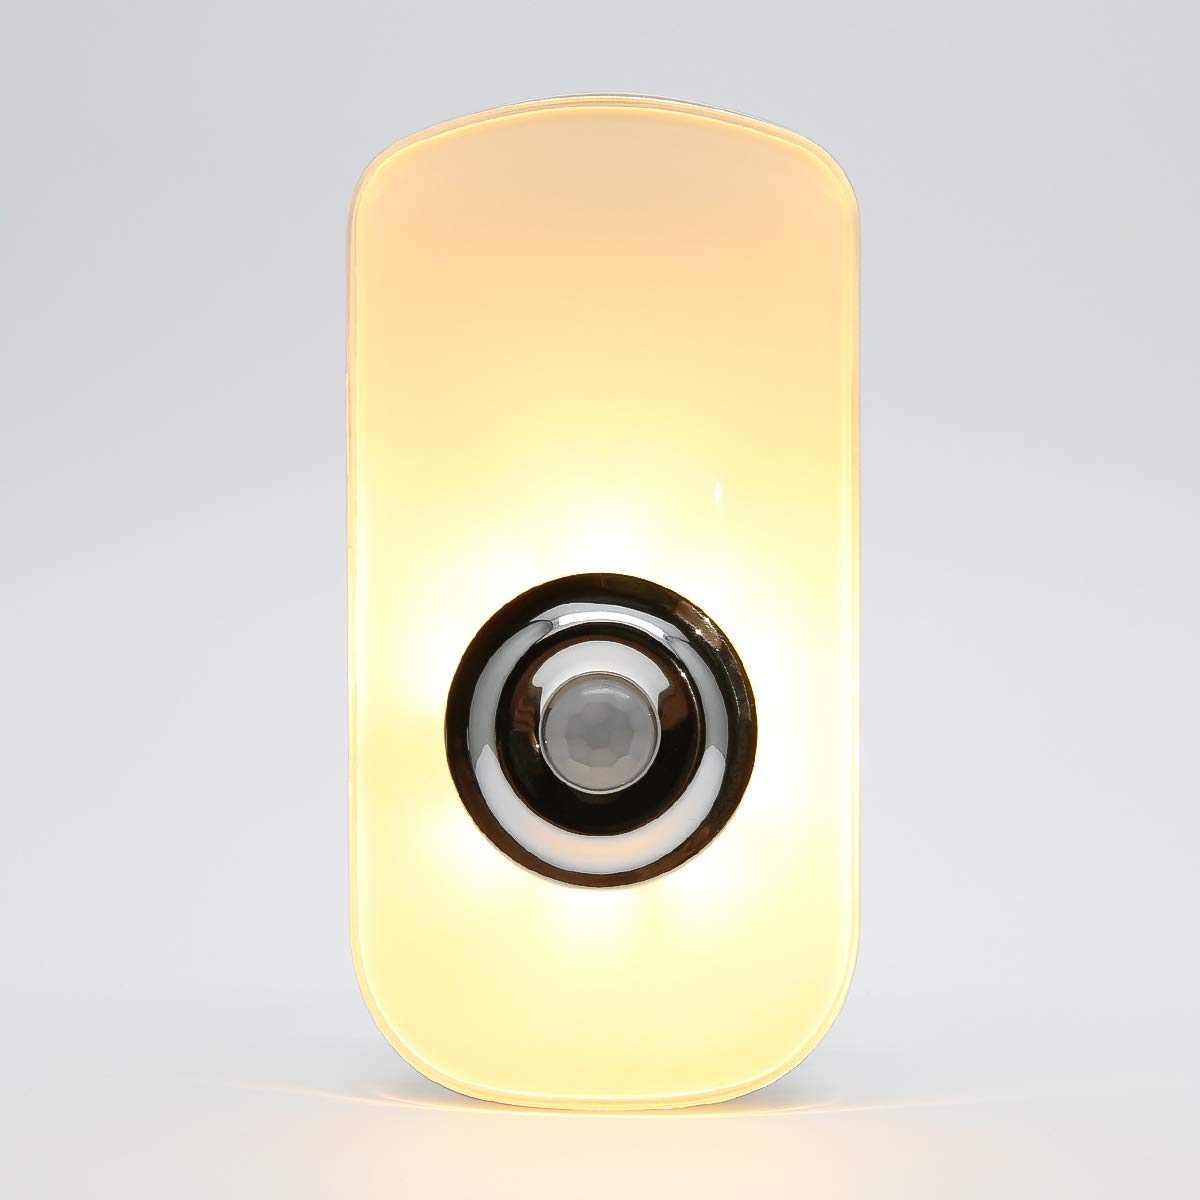 Sensky 3-in-1 Motion Sensor Night Light Plug in, Rechargeable Flashlight, Emergency Night Light for Bedroom, Bathroom, Baby Room, Stairways, Hallways